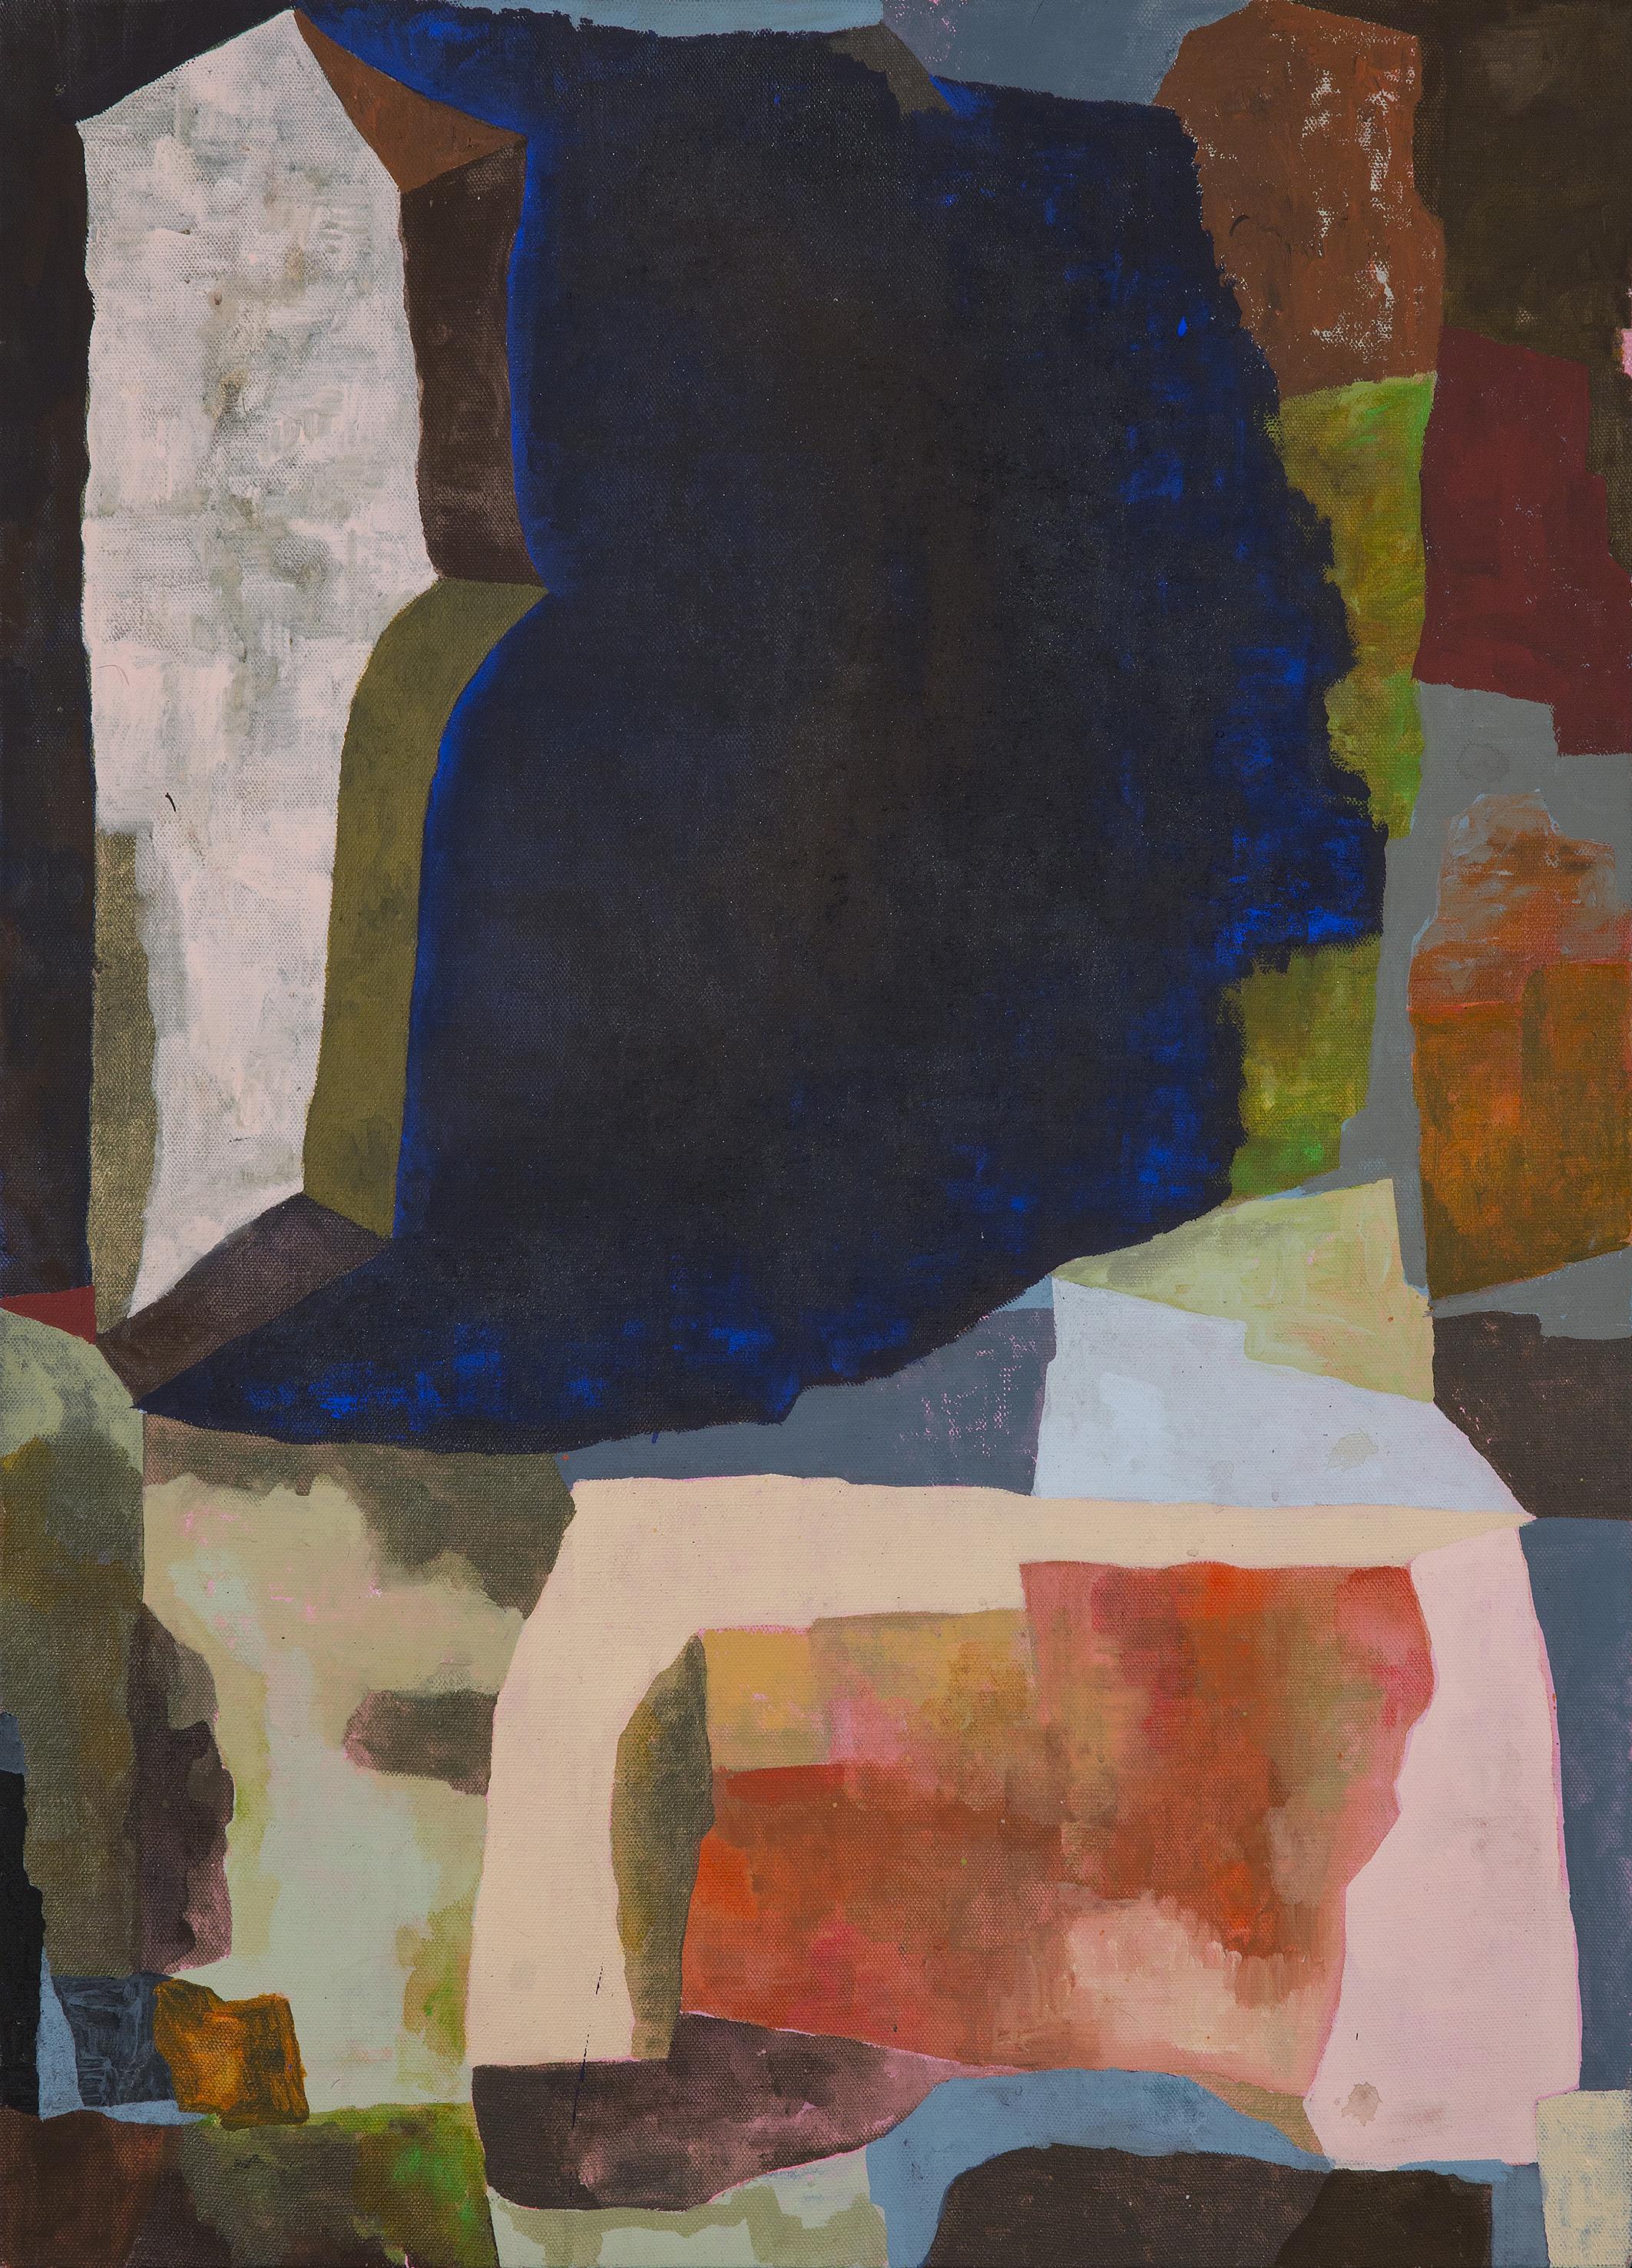 After Gauguin, Mineral II. 2014.